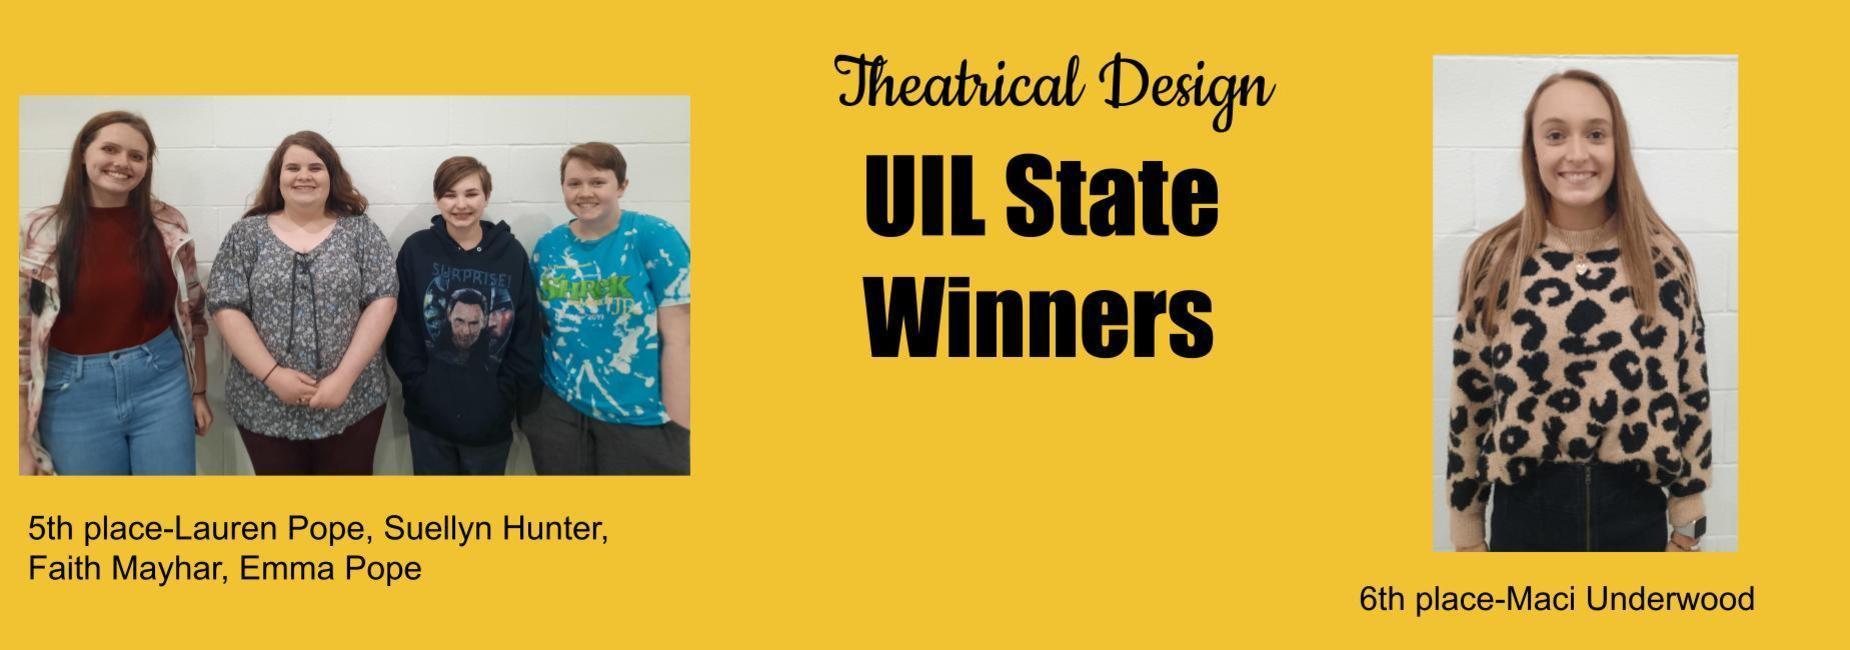 Theatrical design winners